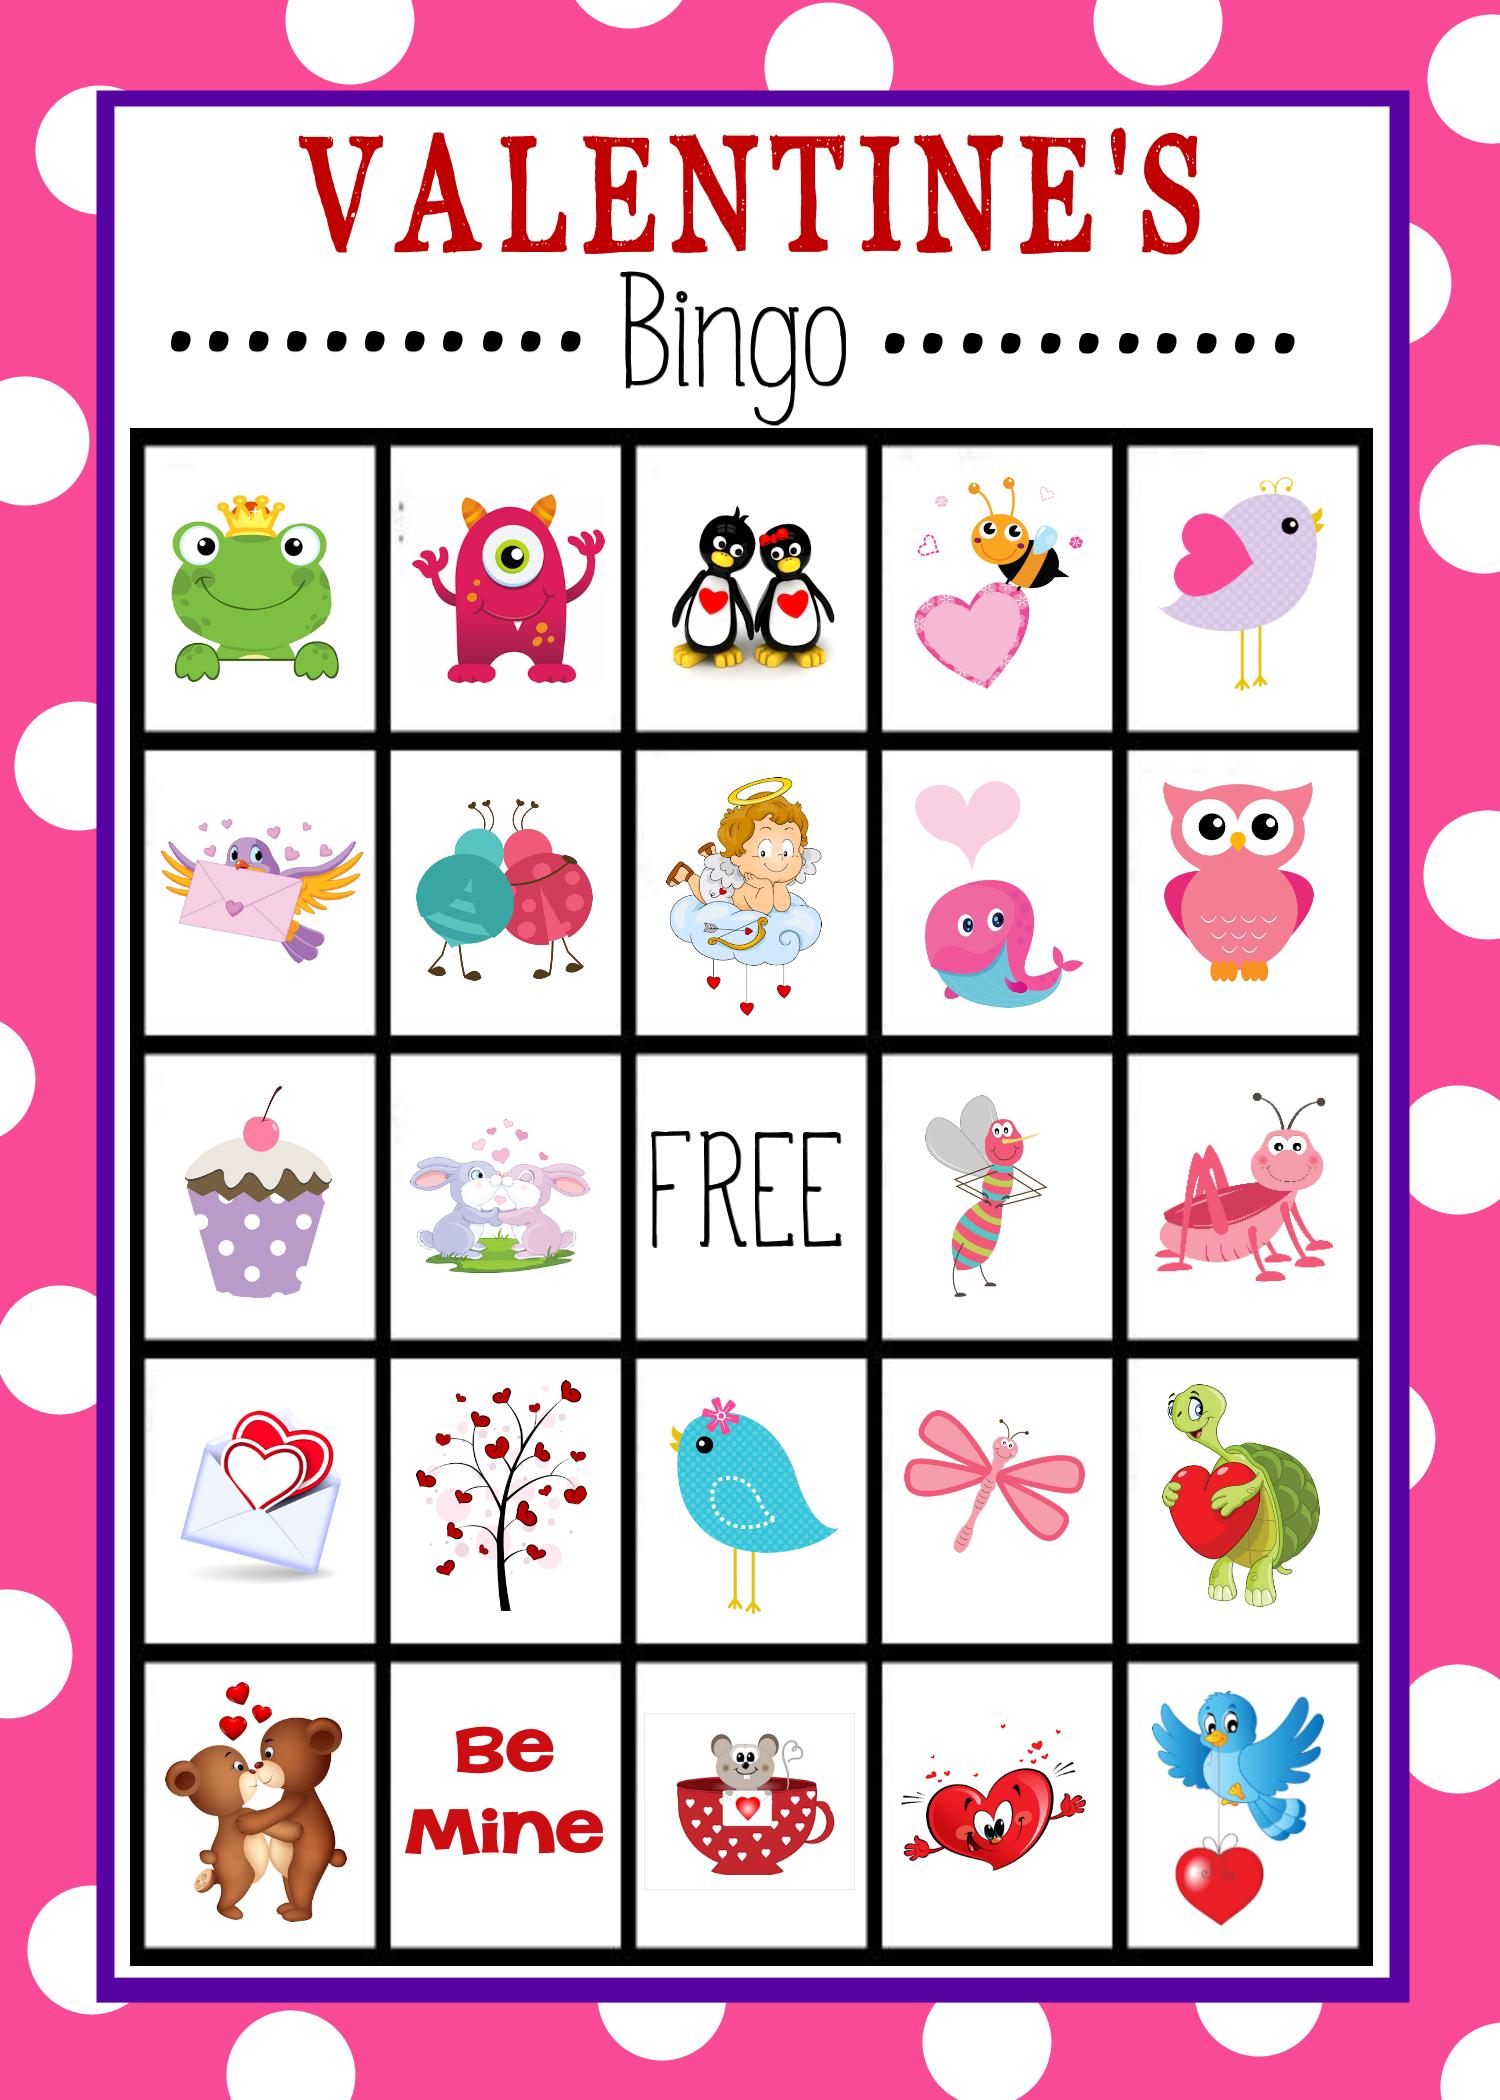 Free Printable Valentine's Day Bingo Game | Valentine's Day - Free Printable Religious Easter Bingo Cards